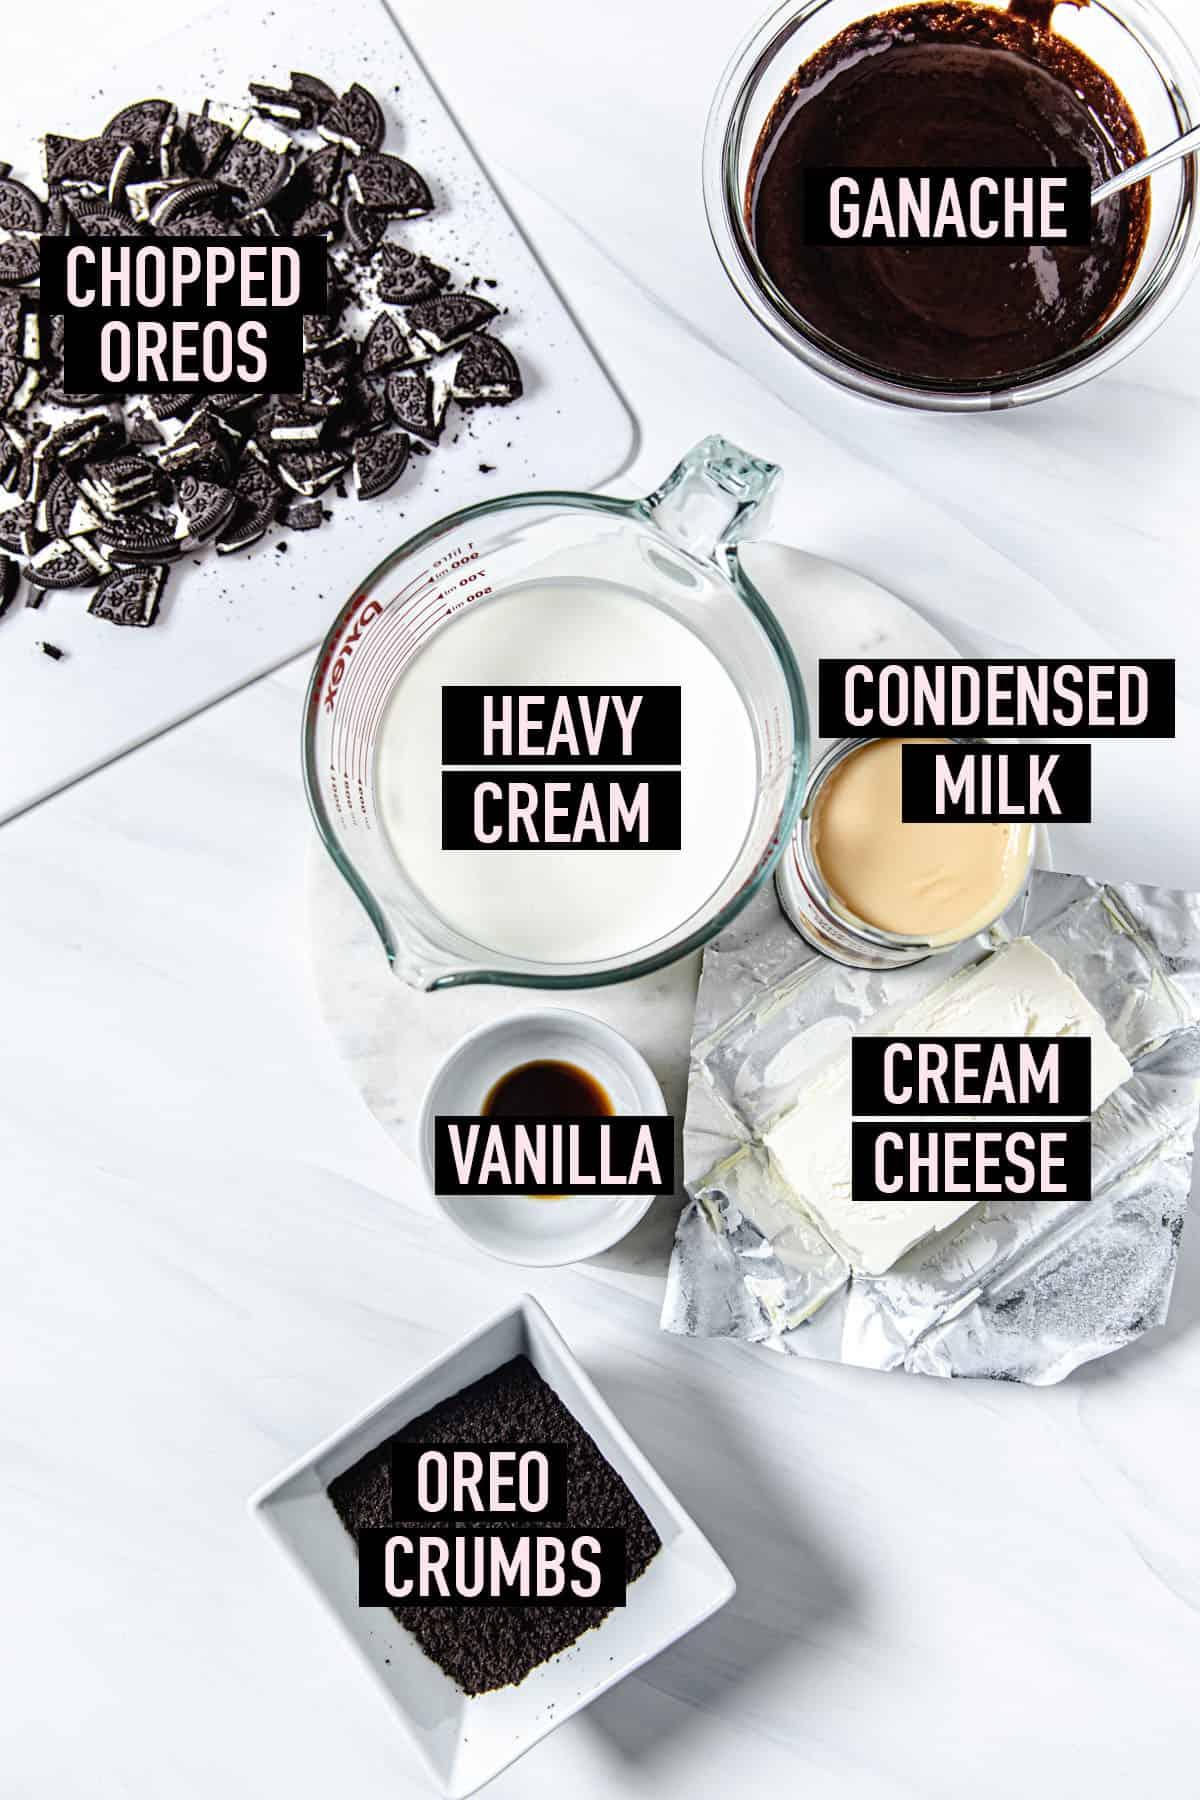 ingredient photo of chopped Oreos, ganache, heavy cream, sweetened condensed milk, vanilla extract, Oreo crumbs and cream cheese